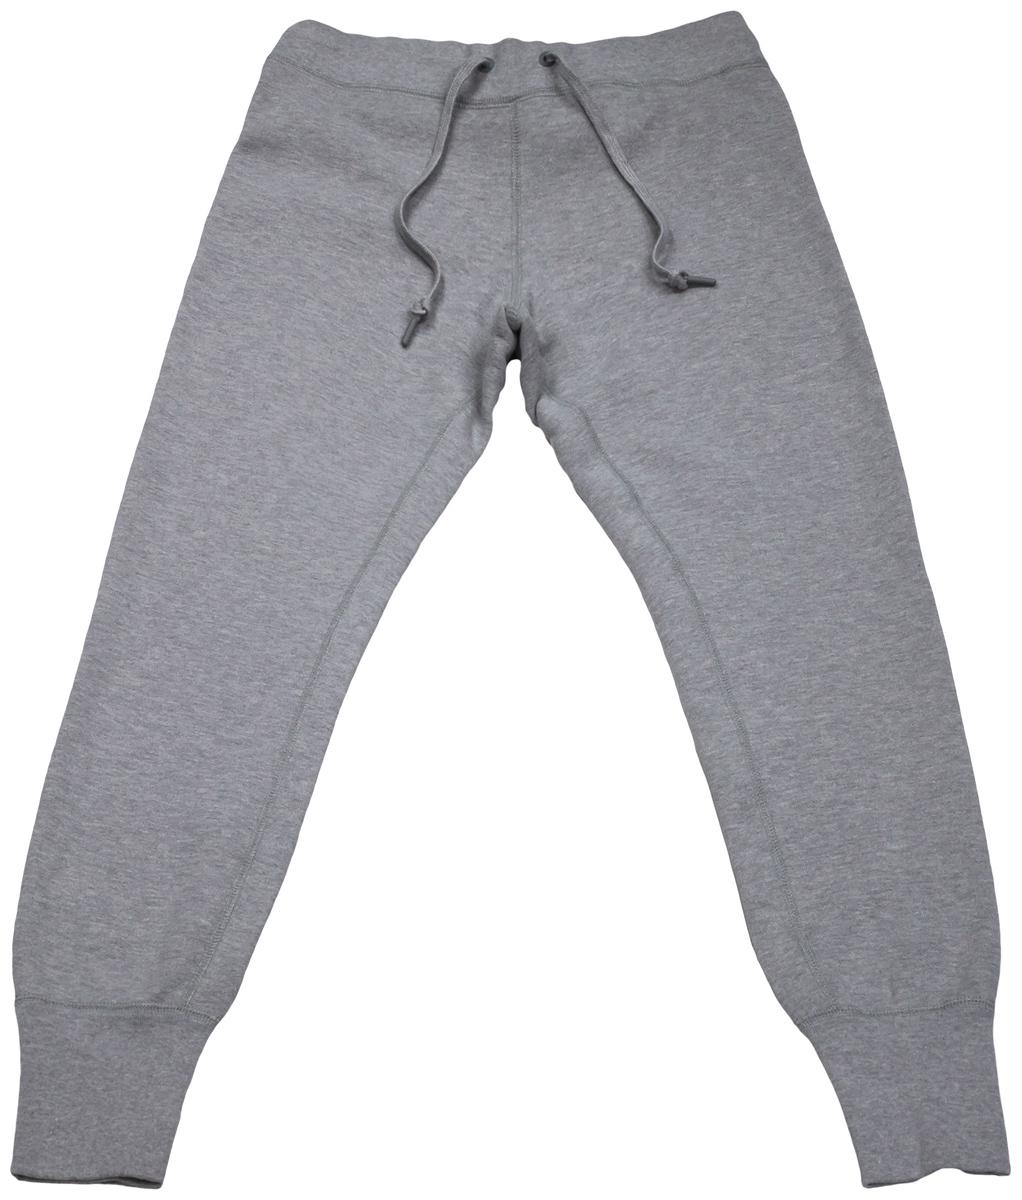 Брюки спортивные жен Converse Sportswear Pant. 1000102002210001020022